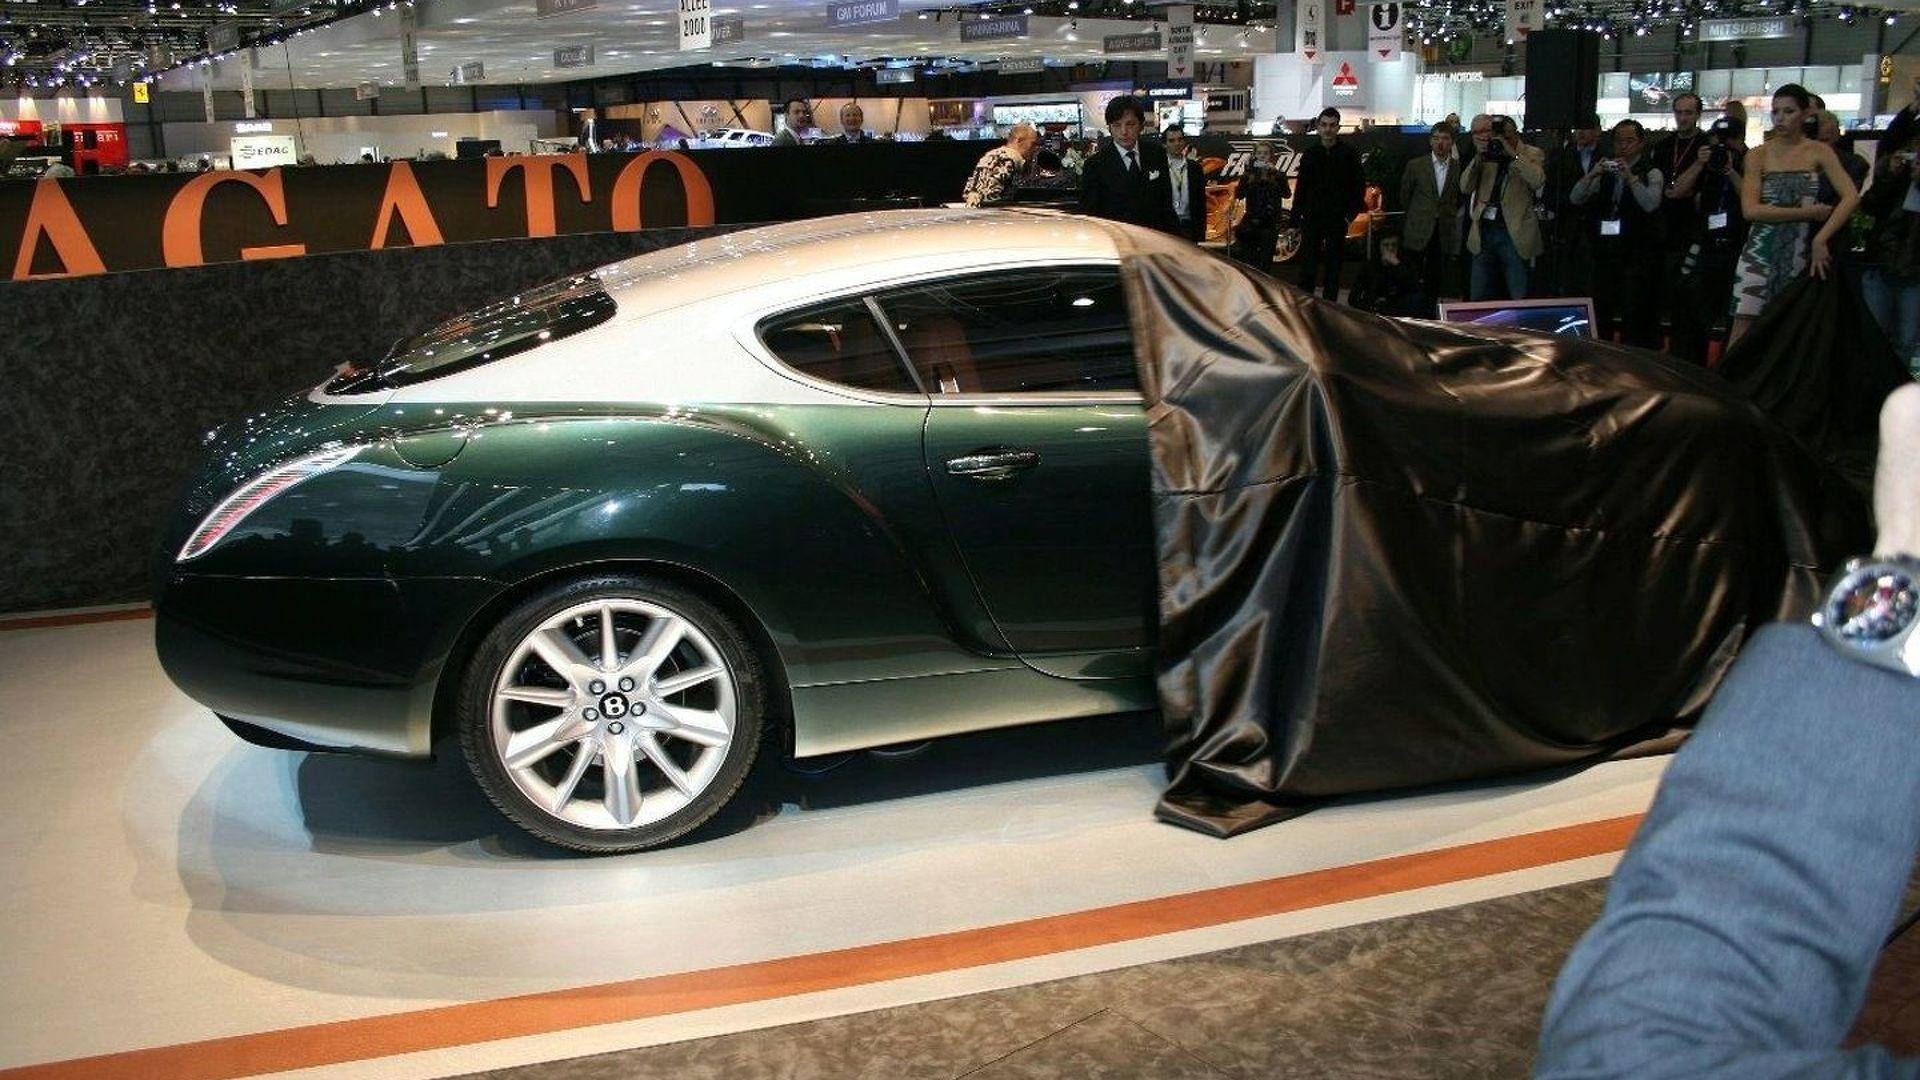 Bentley gtz zagato unveiled at the geneva motor show bentley gtz zagato unveiled at the geneva motor show product 2008 03 05 072231 vanachro Images